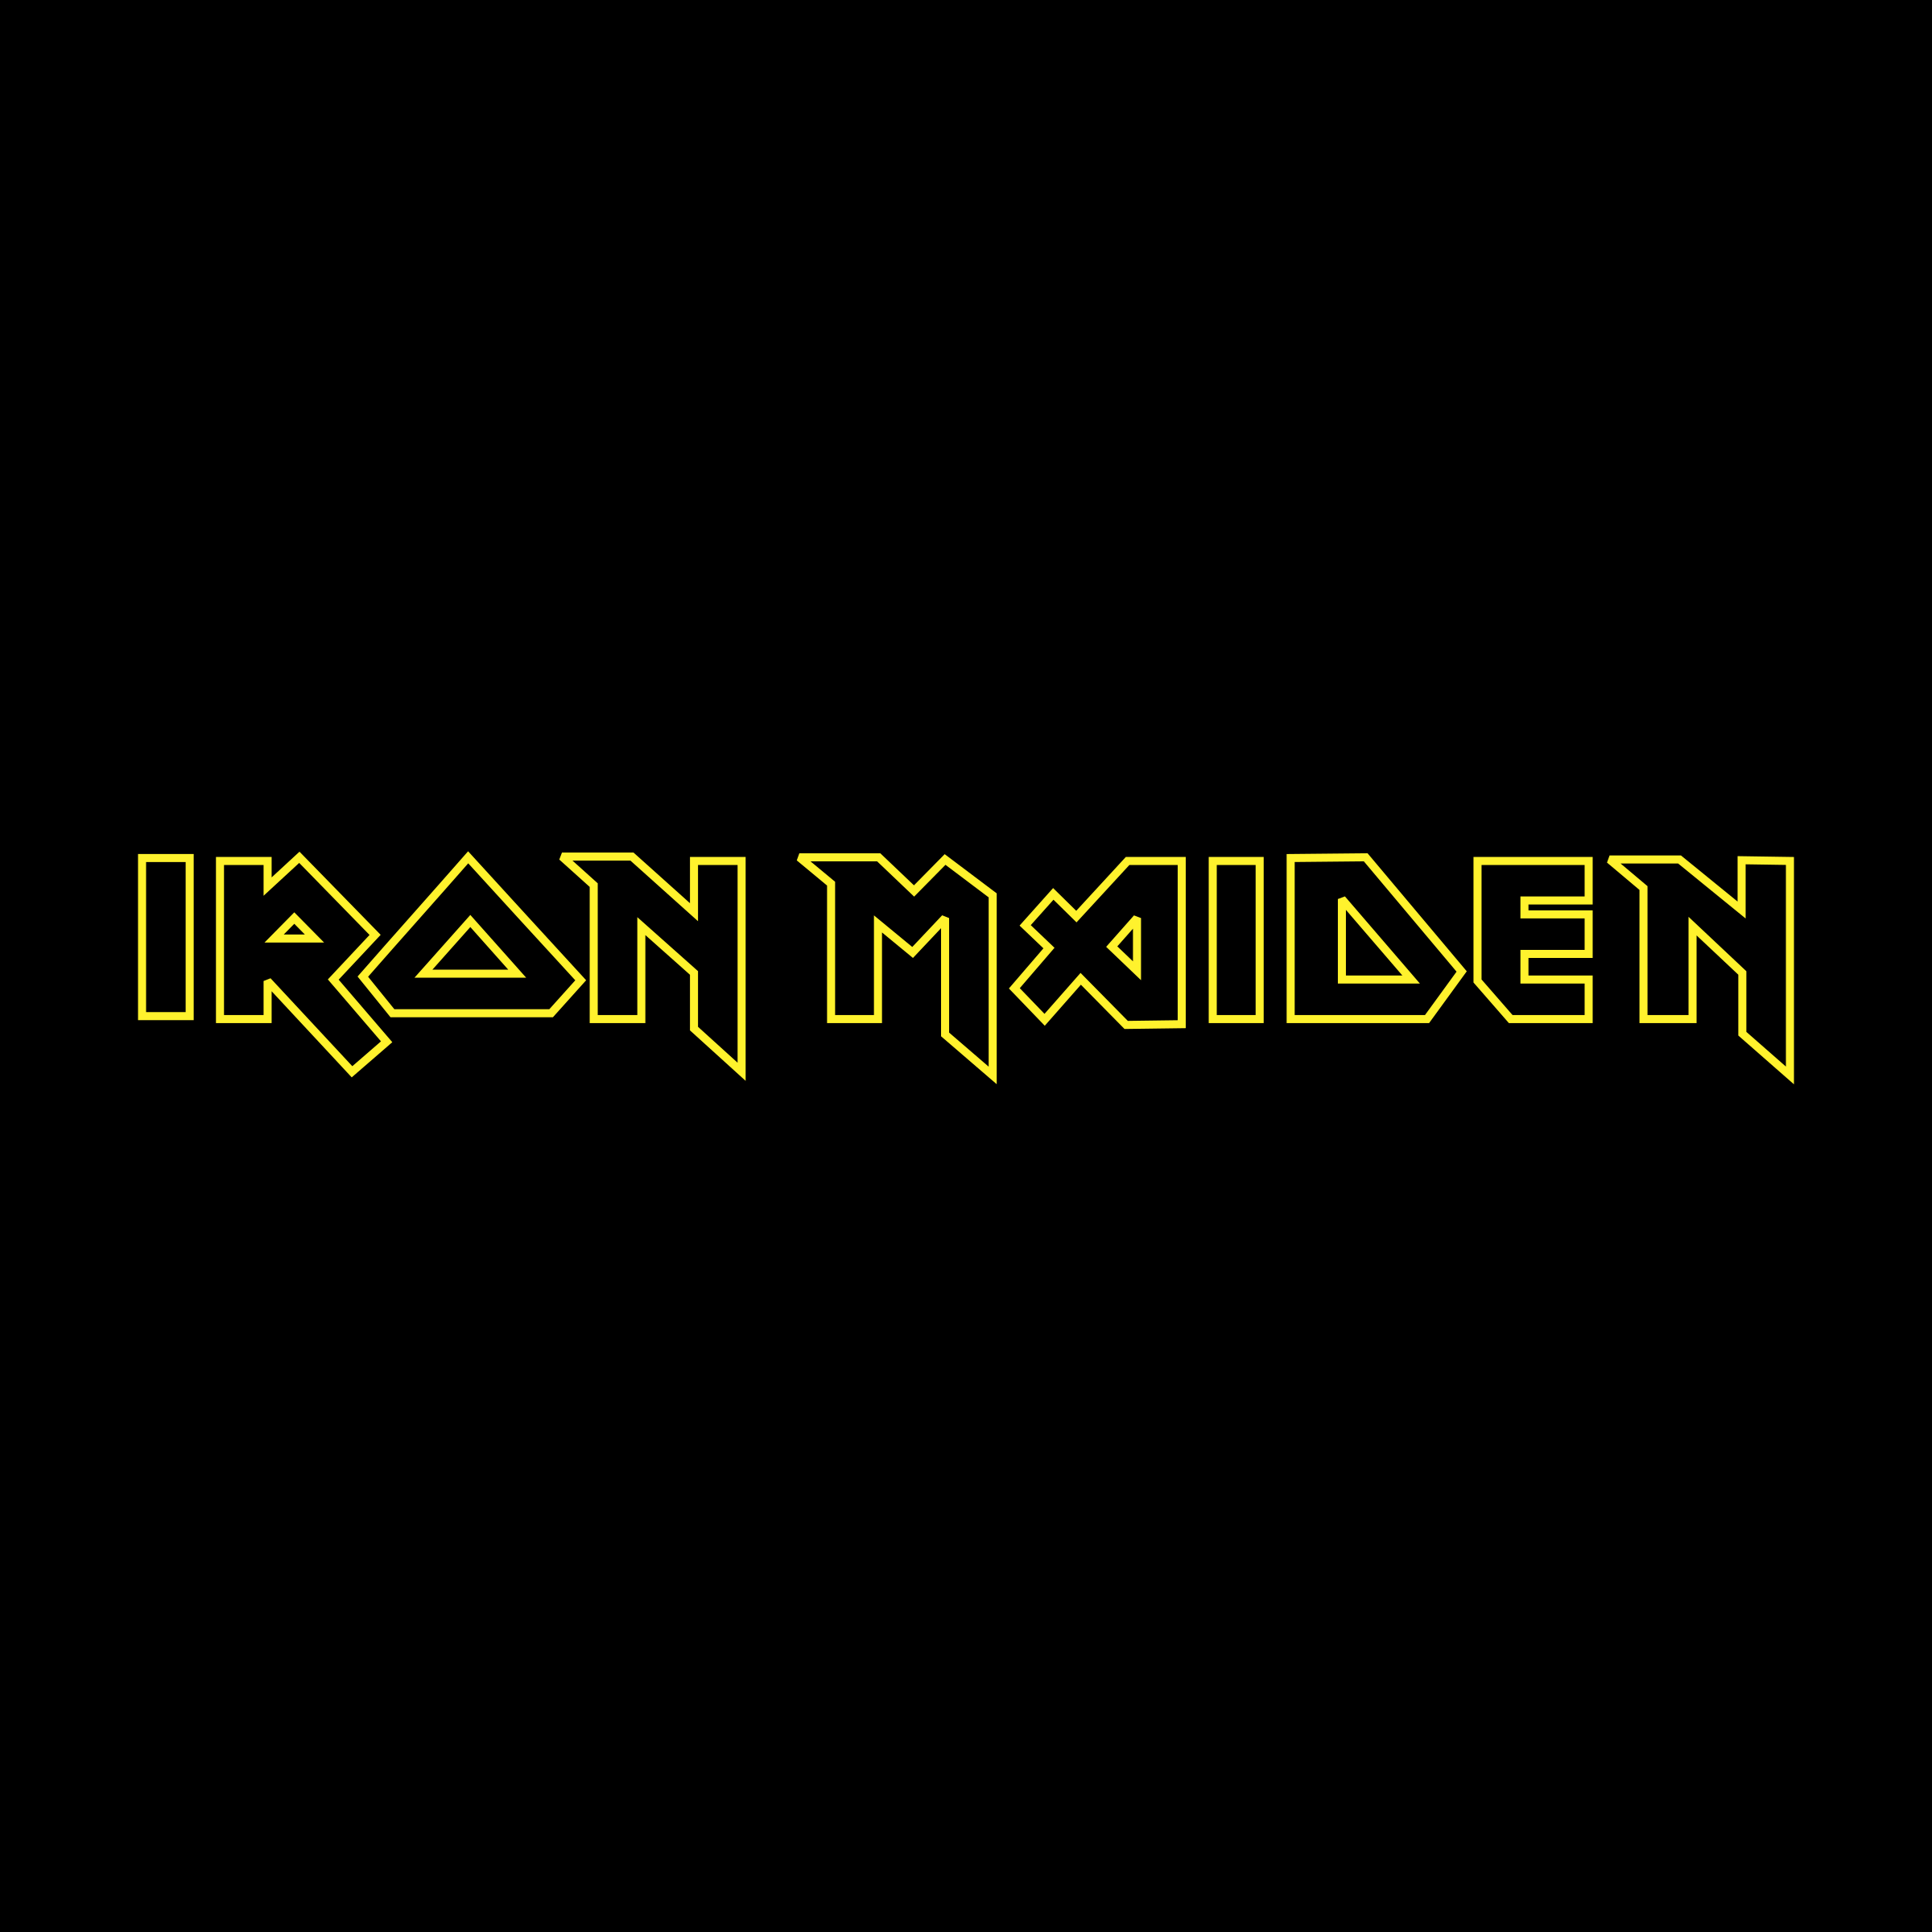 Iron Maiden Logo PNG Transparent SVG Vector